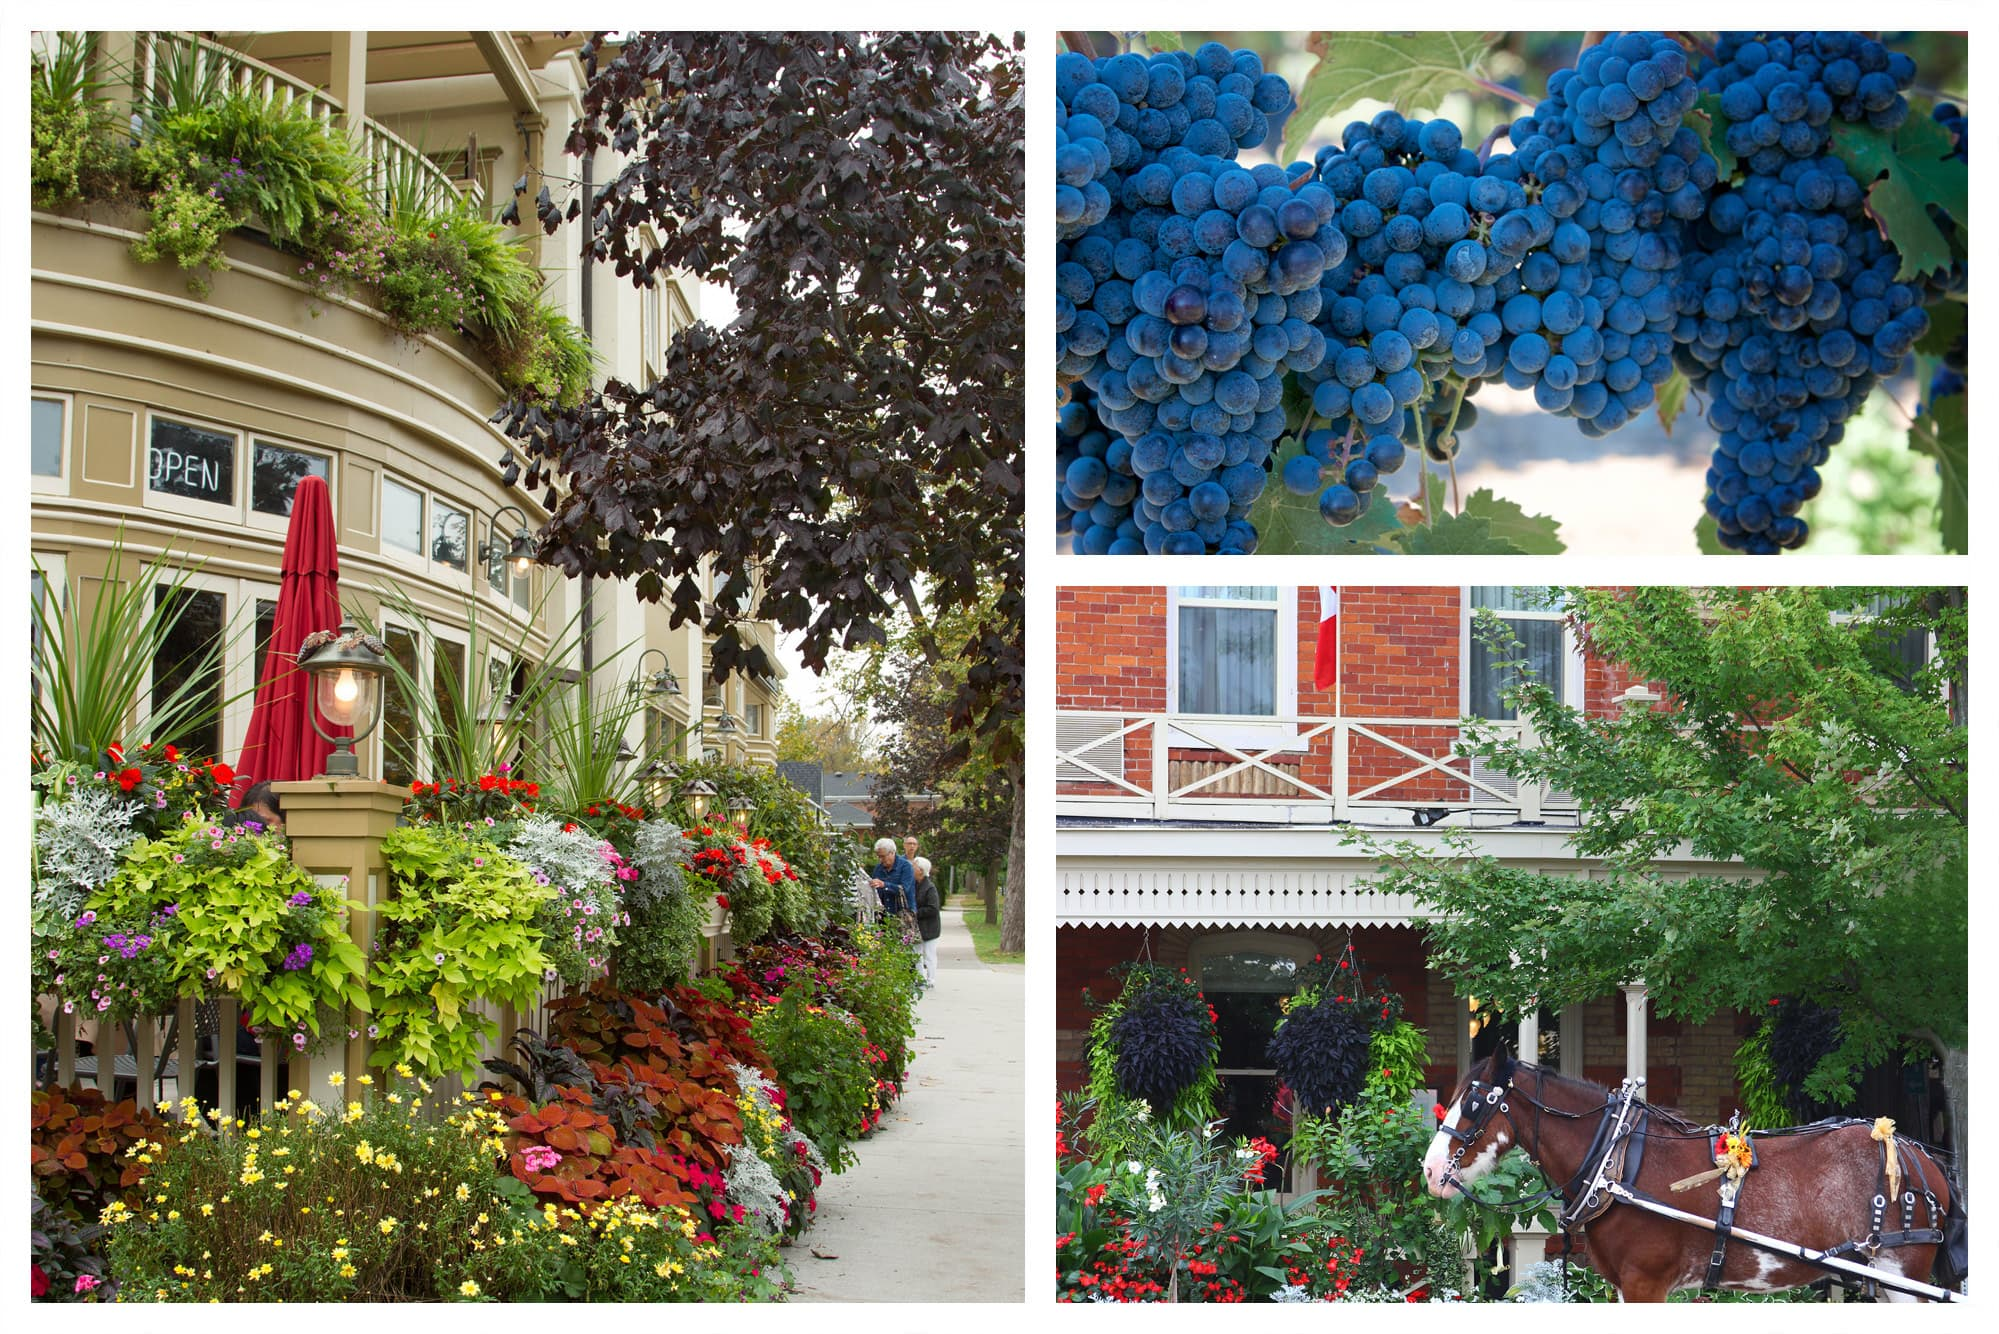 Niagara, Ontario Vacation Places to Visit